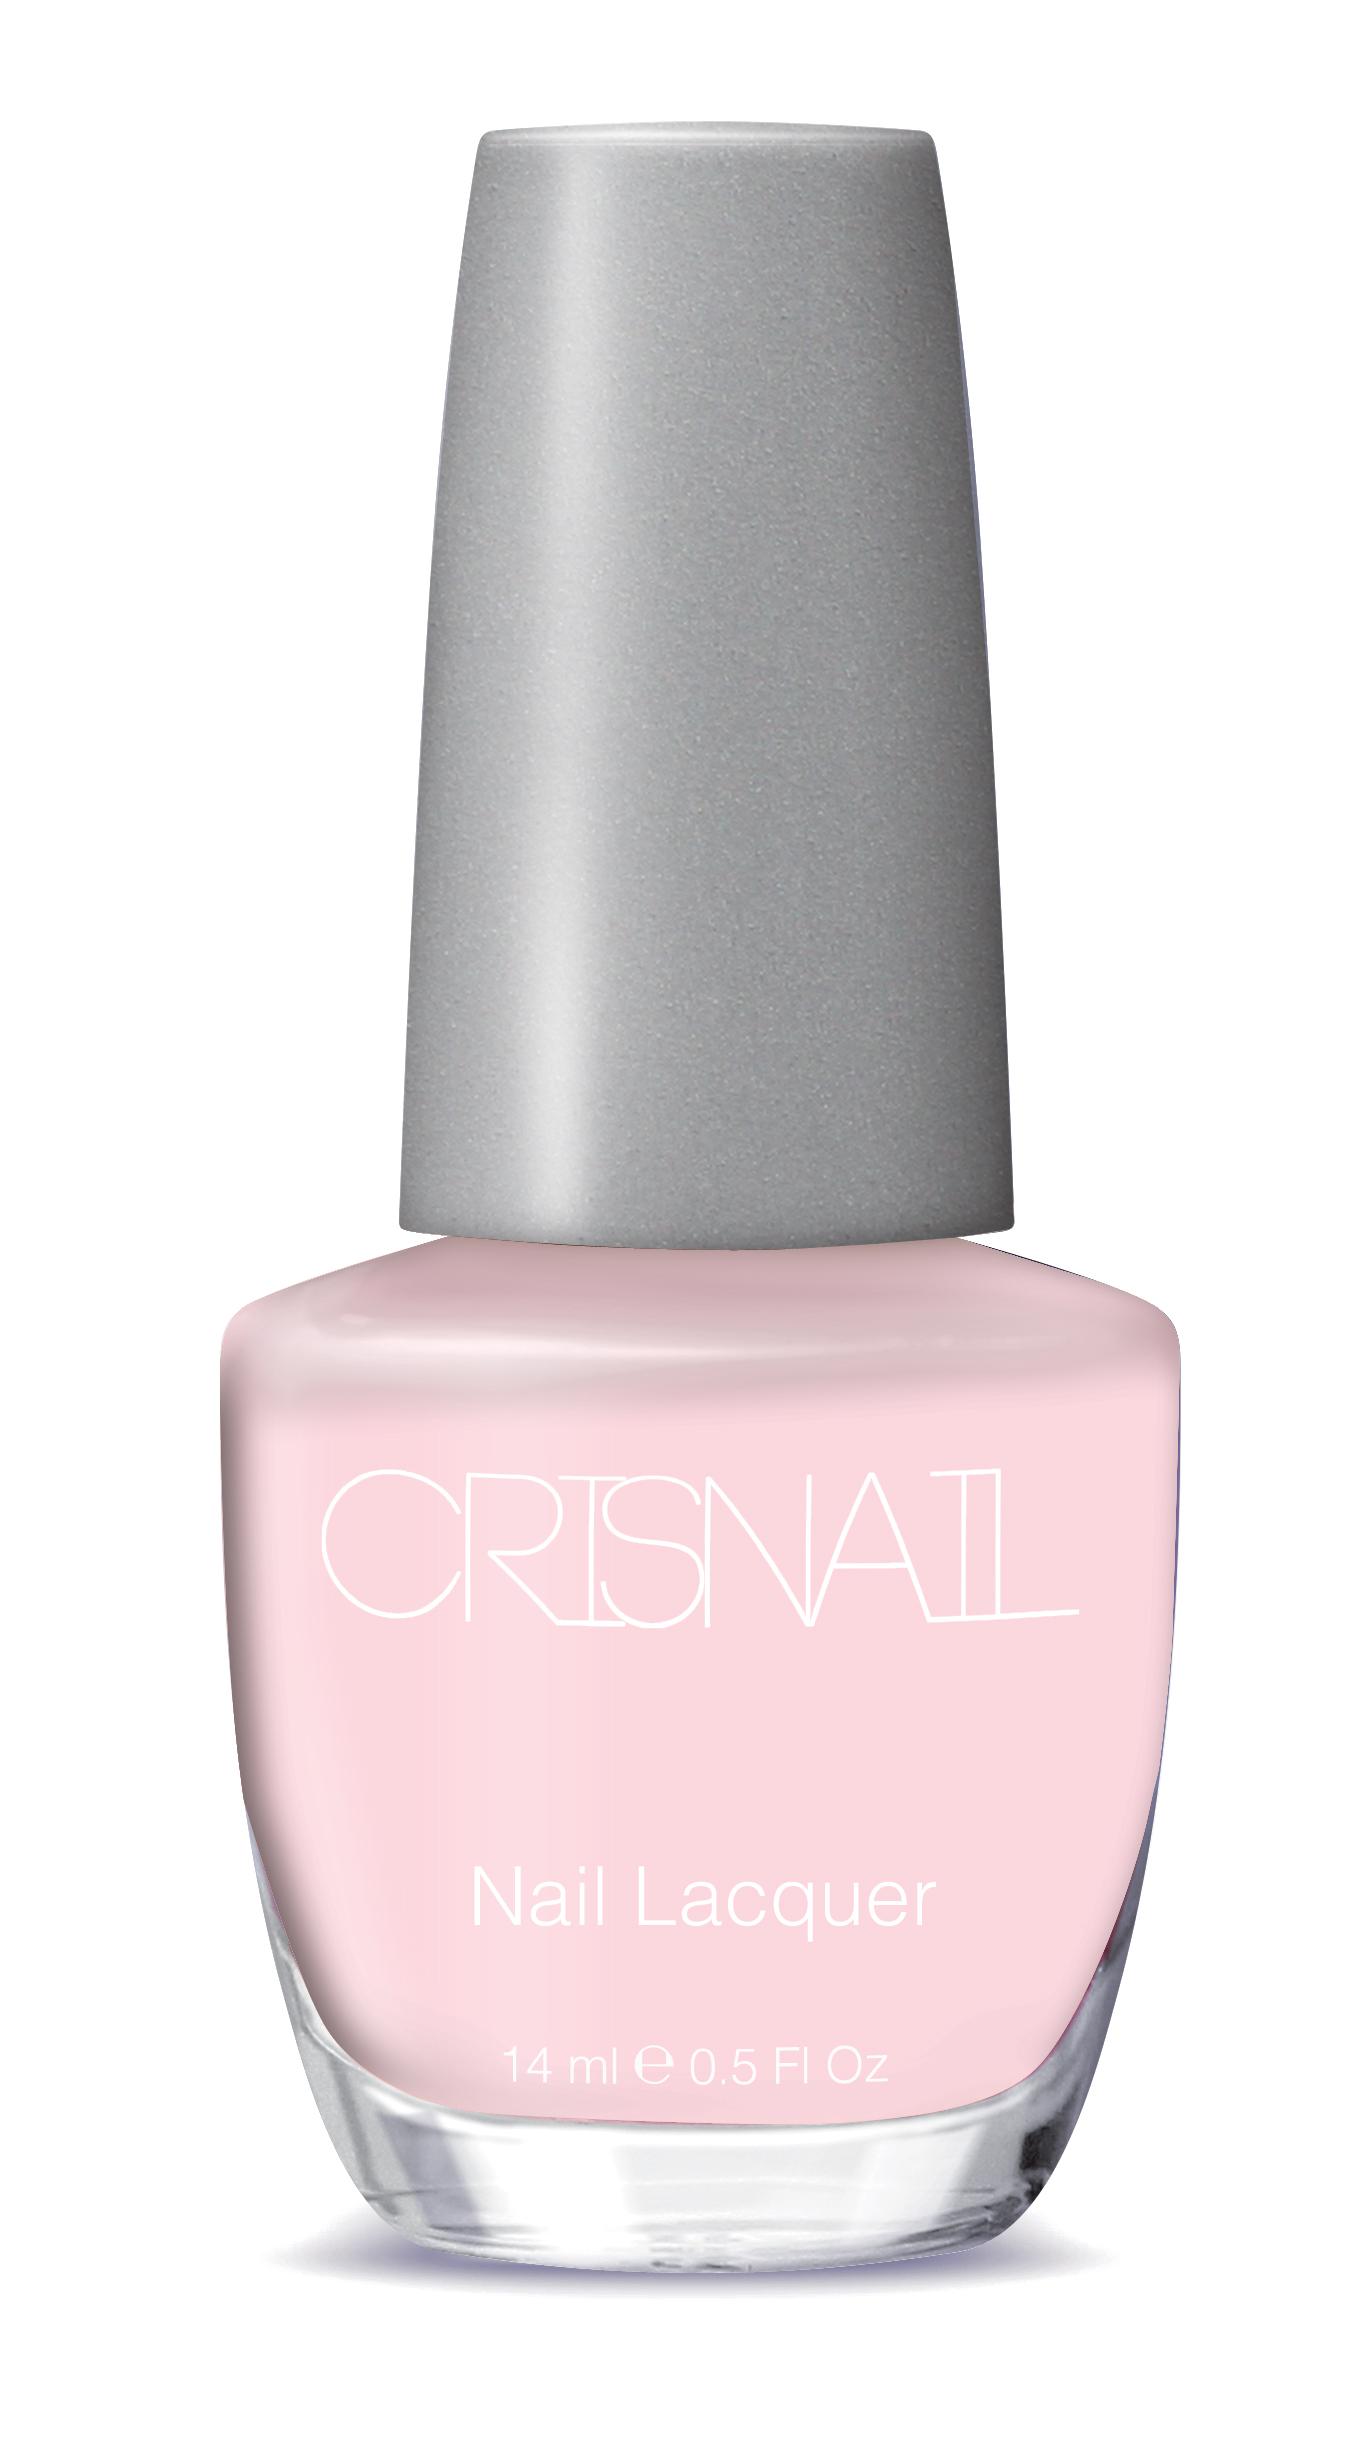 CRISNAIL Colour Lacquer Pastel Pink - Exclusive Beauty Solutions